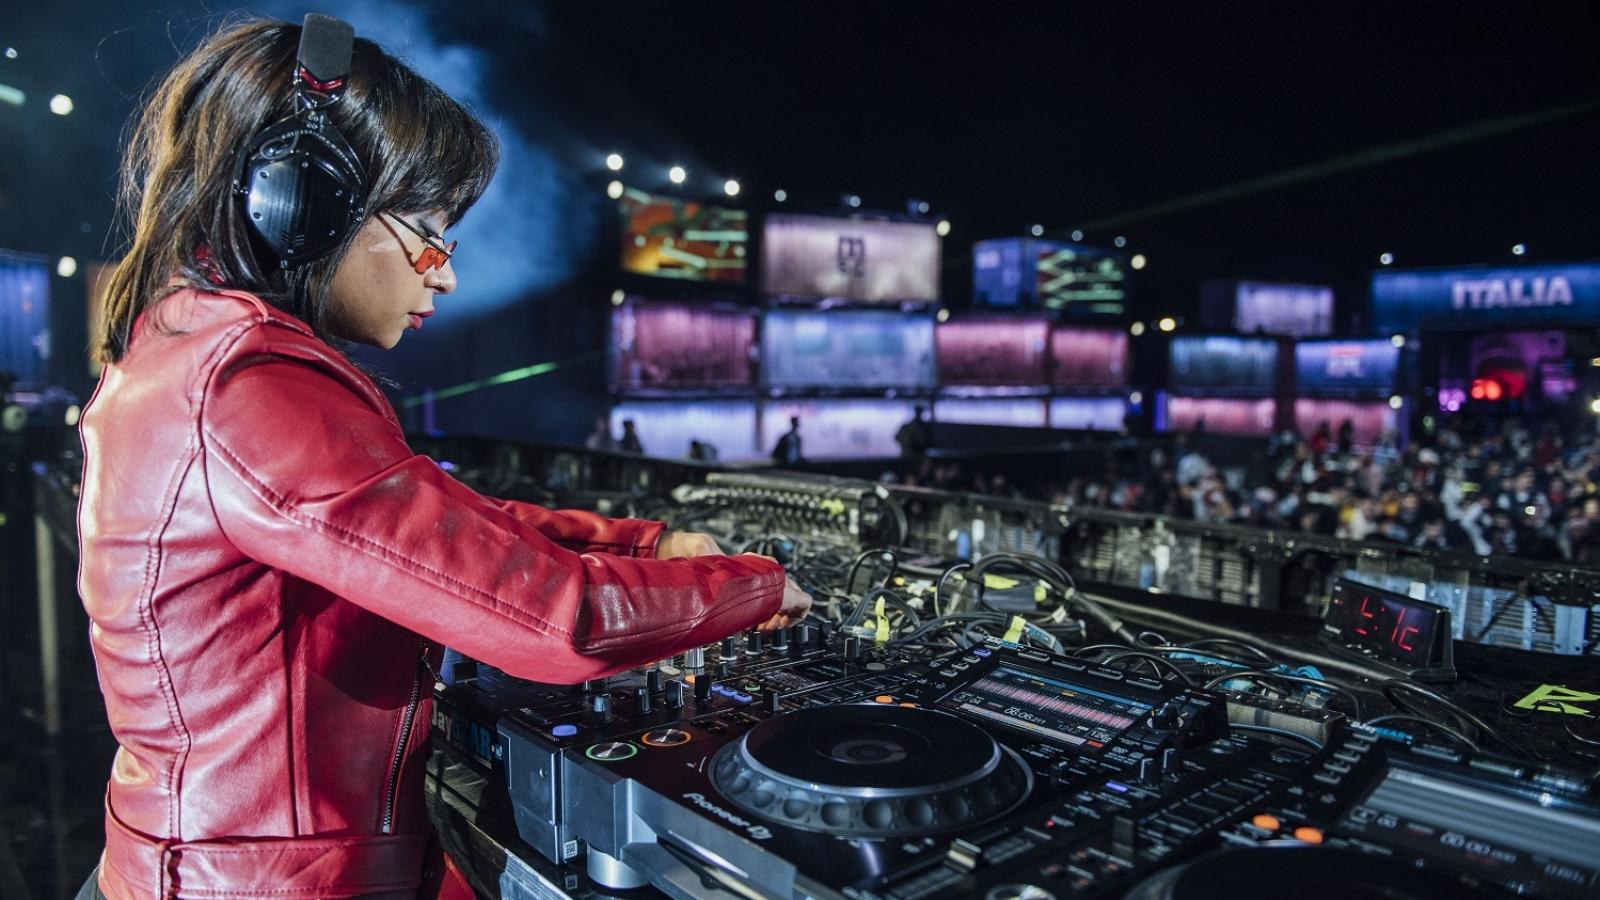 DJ Cosmicat performs at MDLBEAST Festival 2019